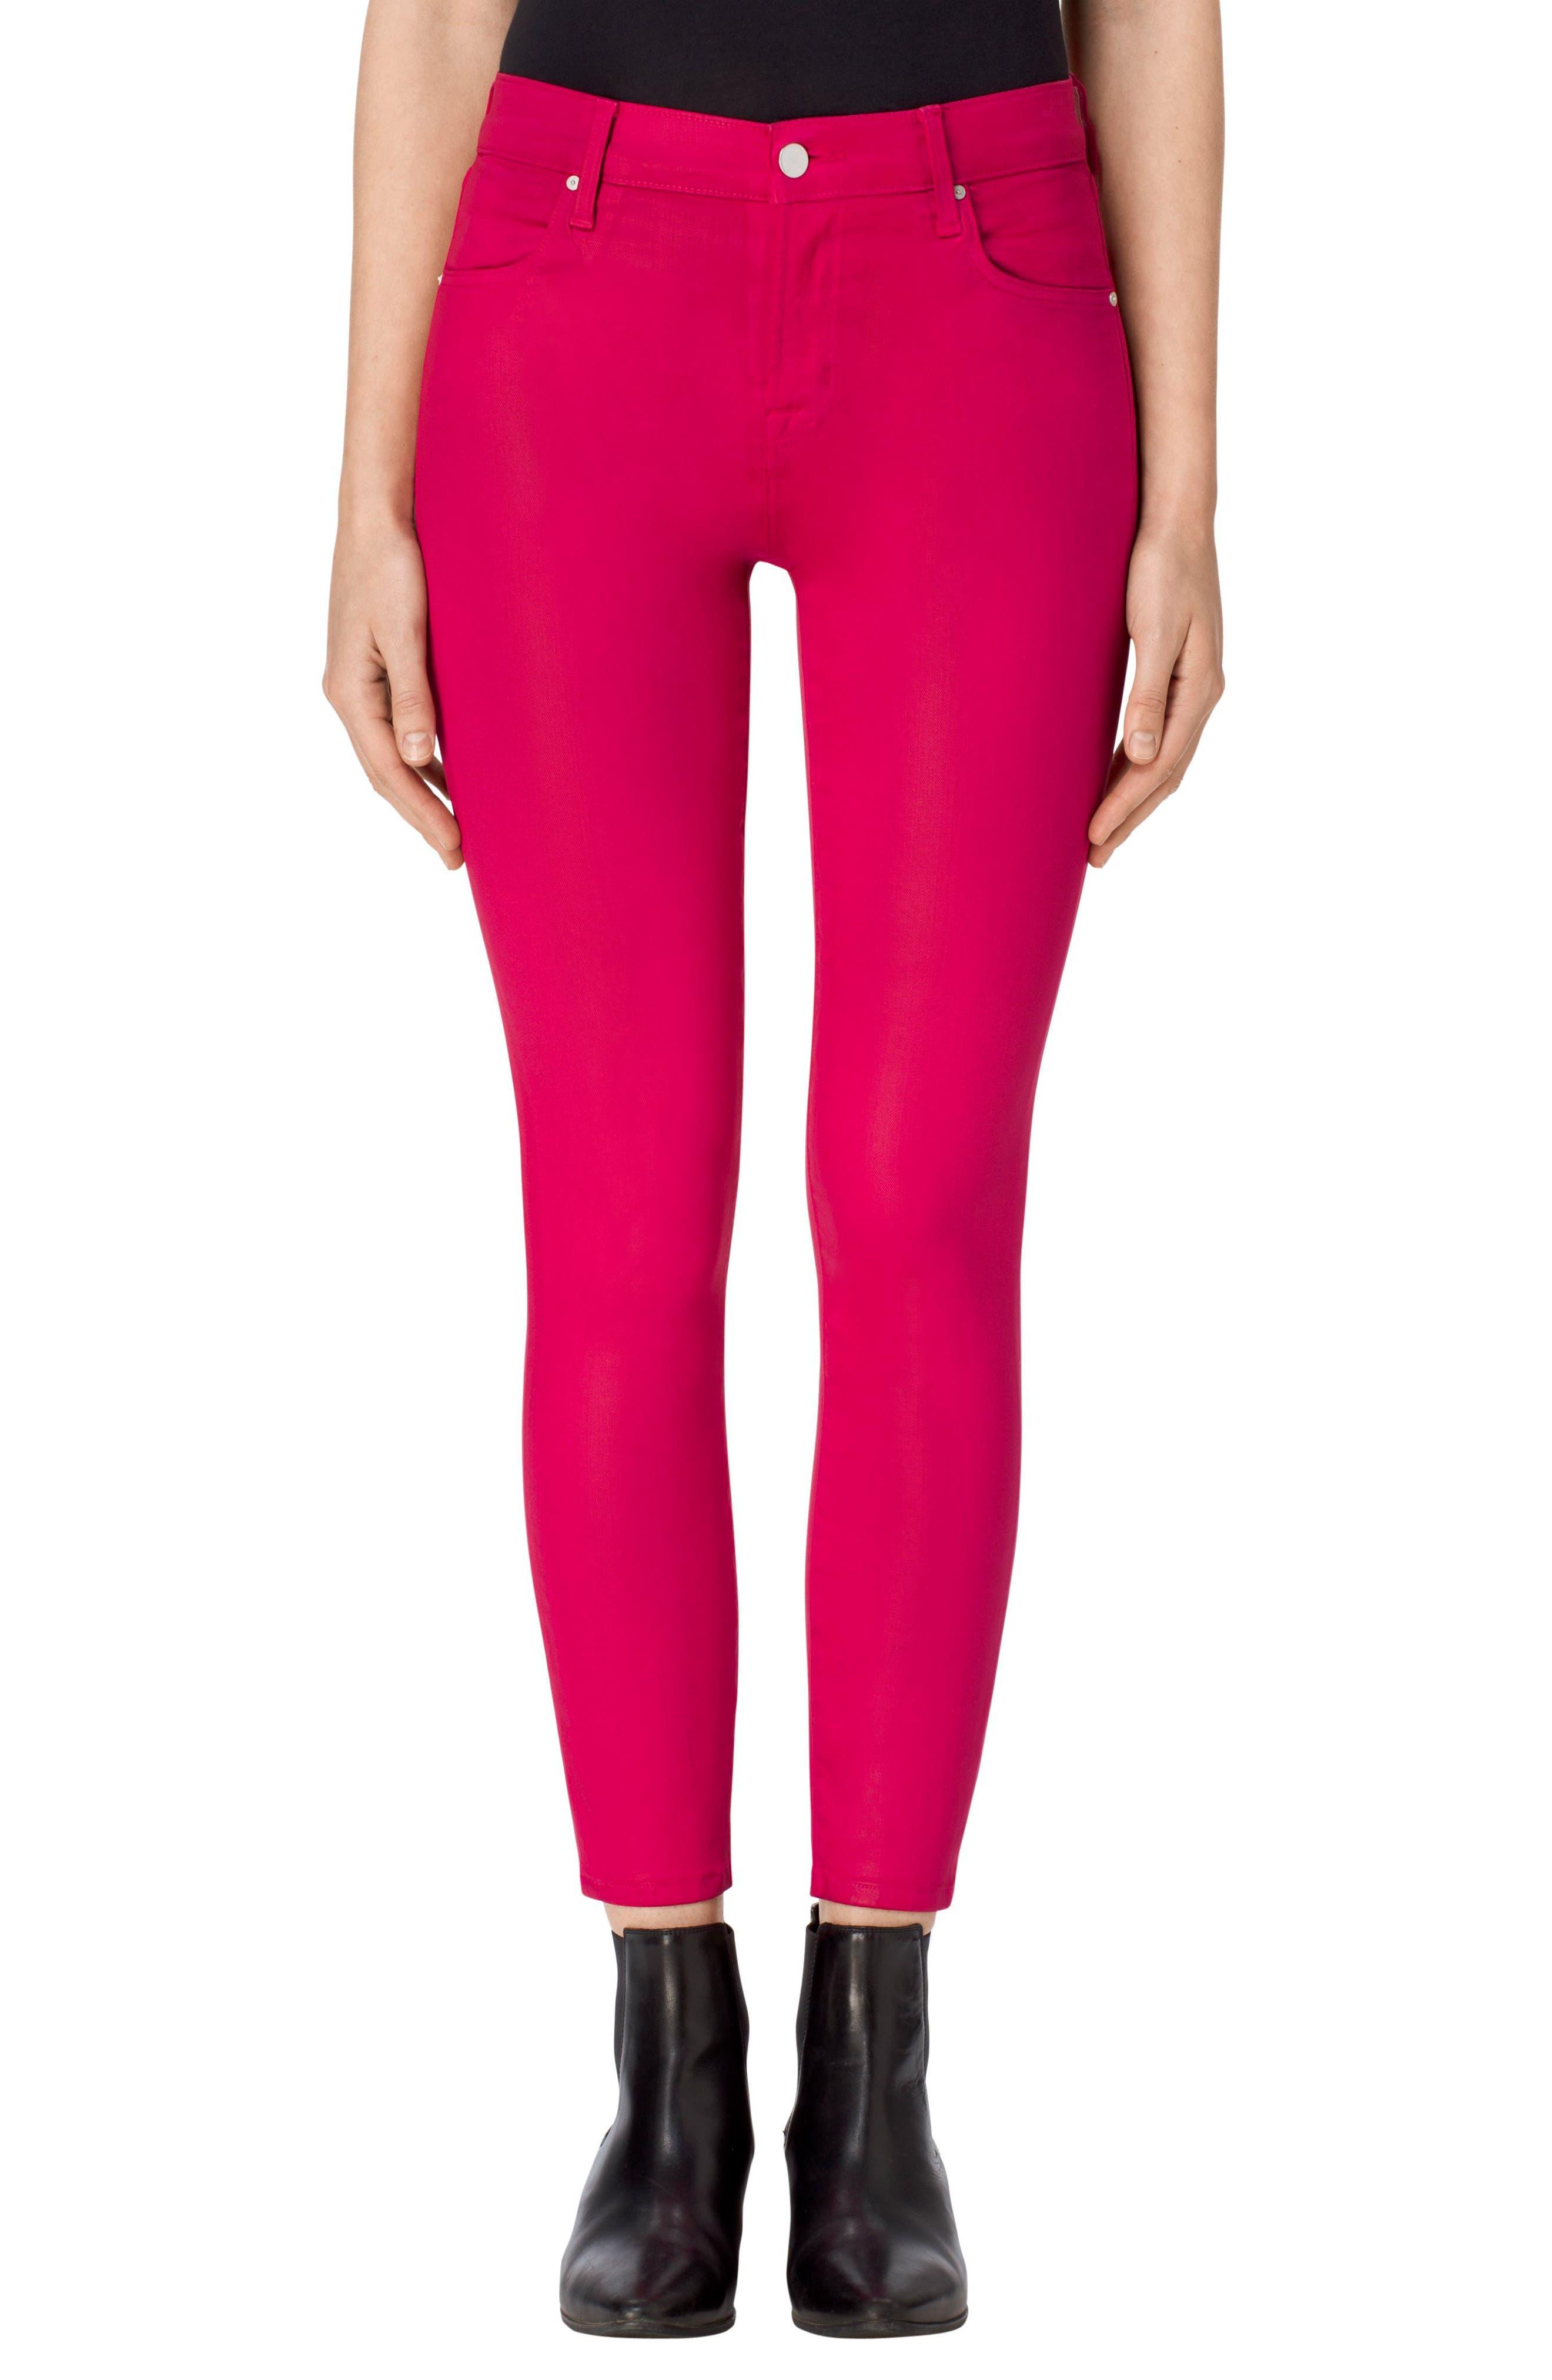 Alternate Image 1 Selected - J Brand Alana High Waist Crop Skinny Jeans